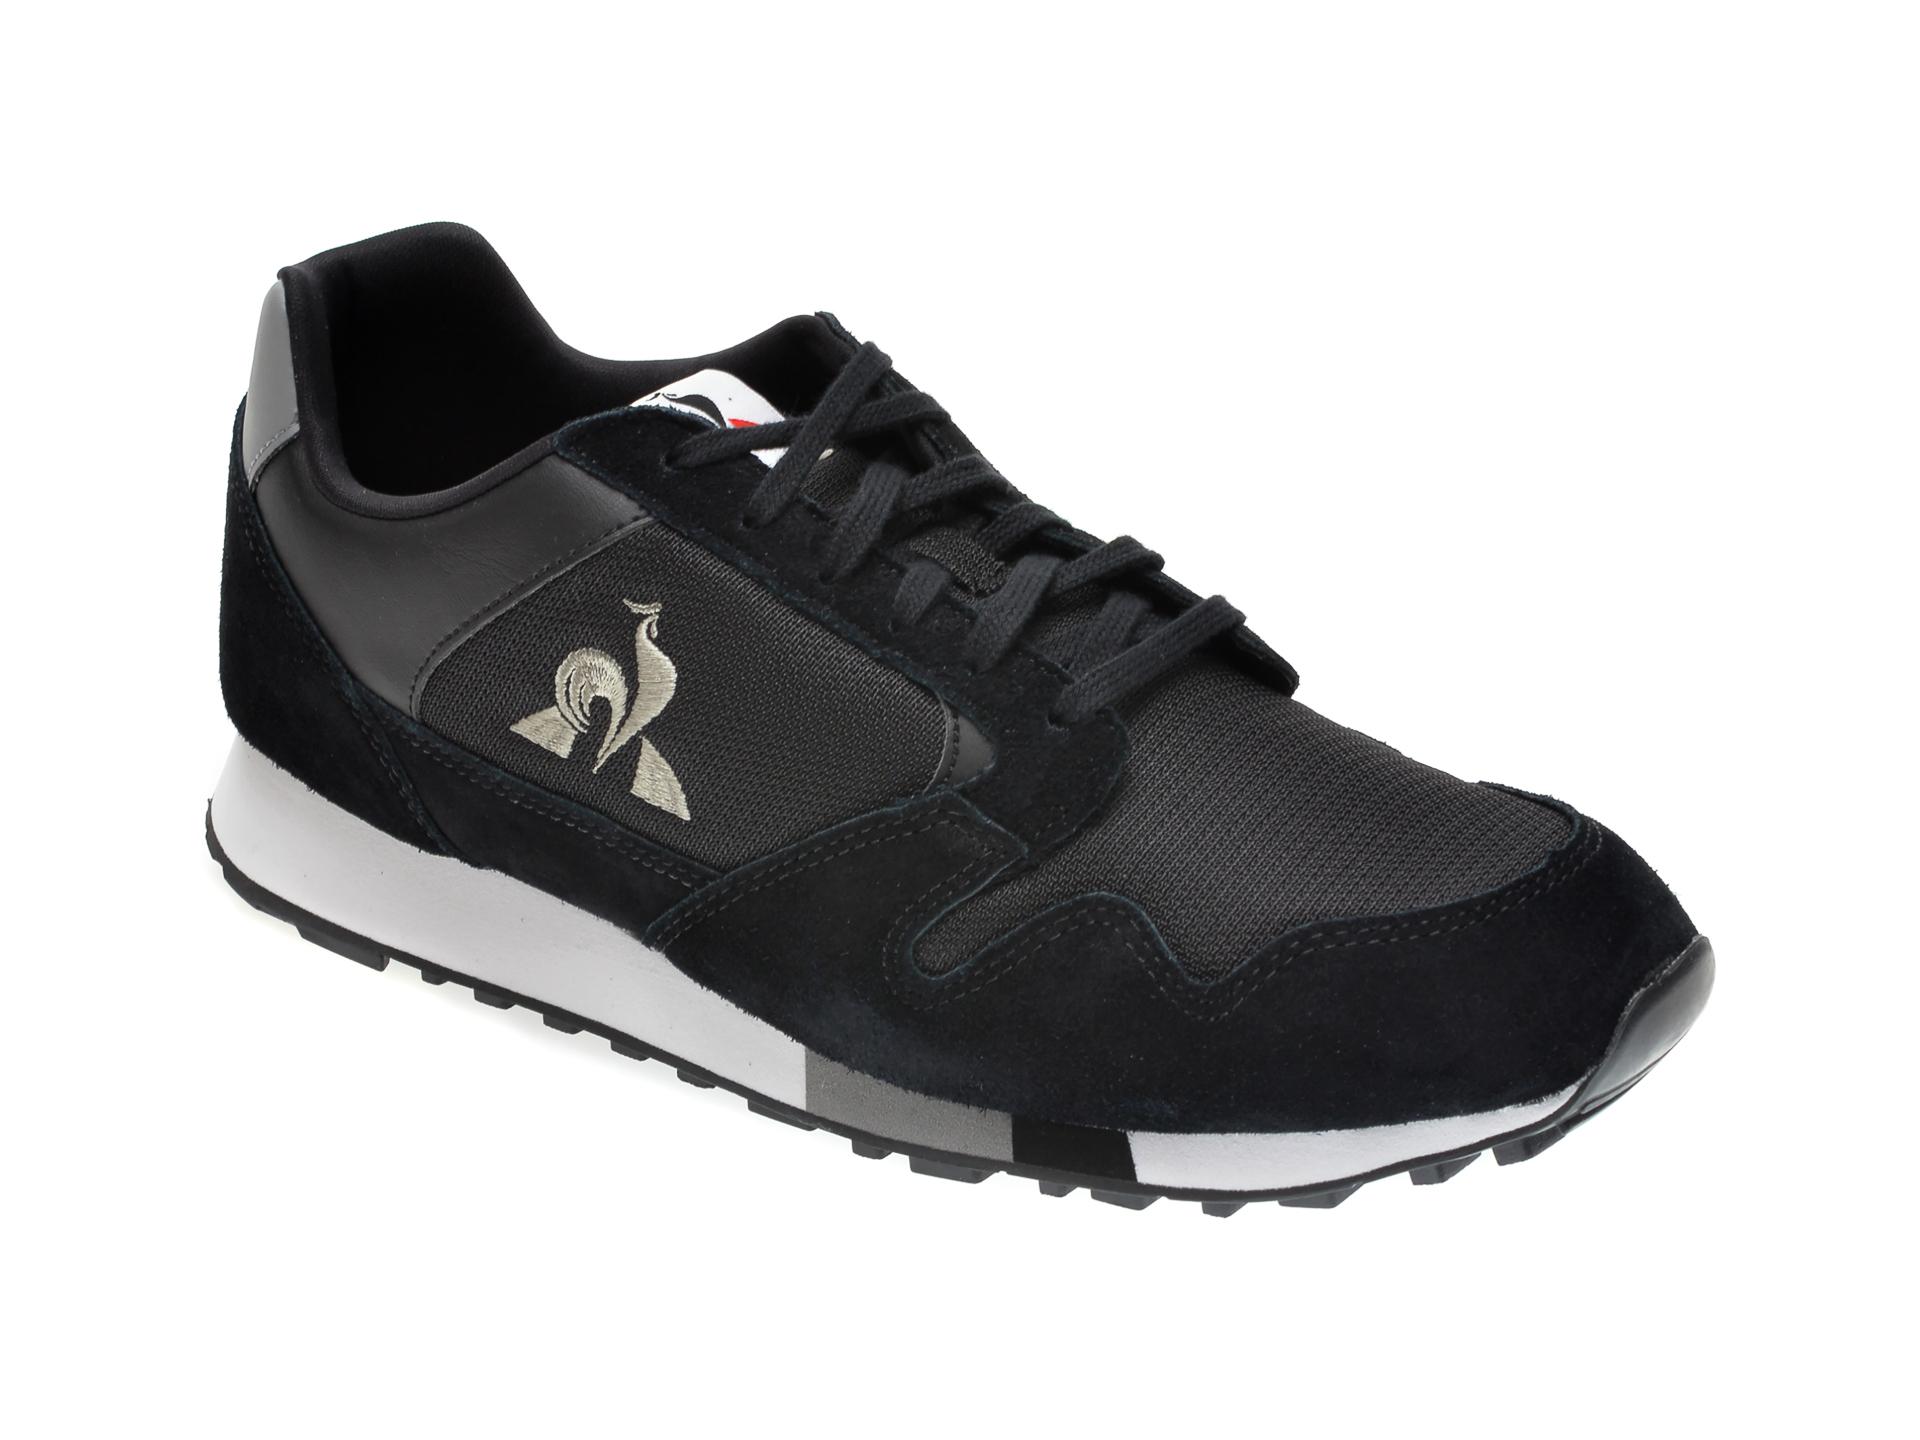 Pantofi sport LE COQ SPORTIF negri, 2020299, din material textil si piele intoarsa imagine otter.ro 2021